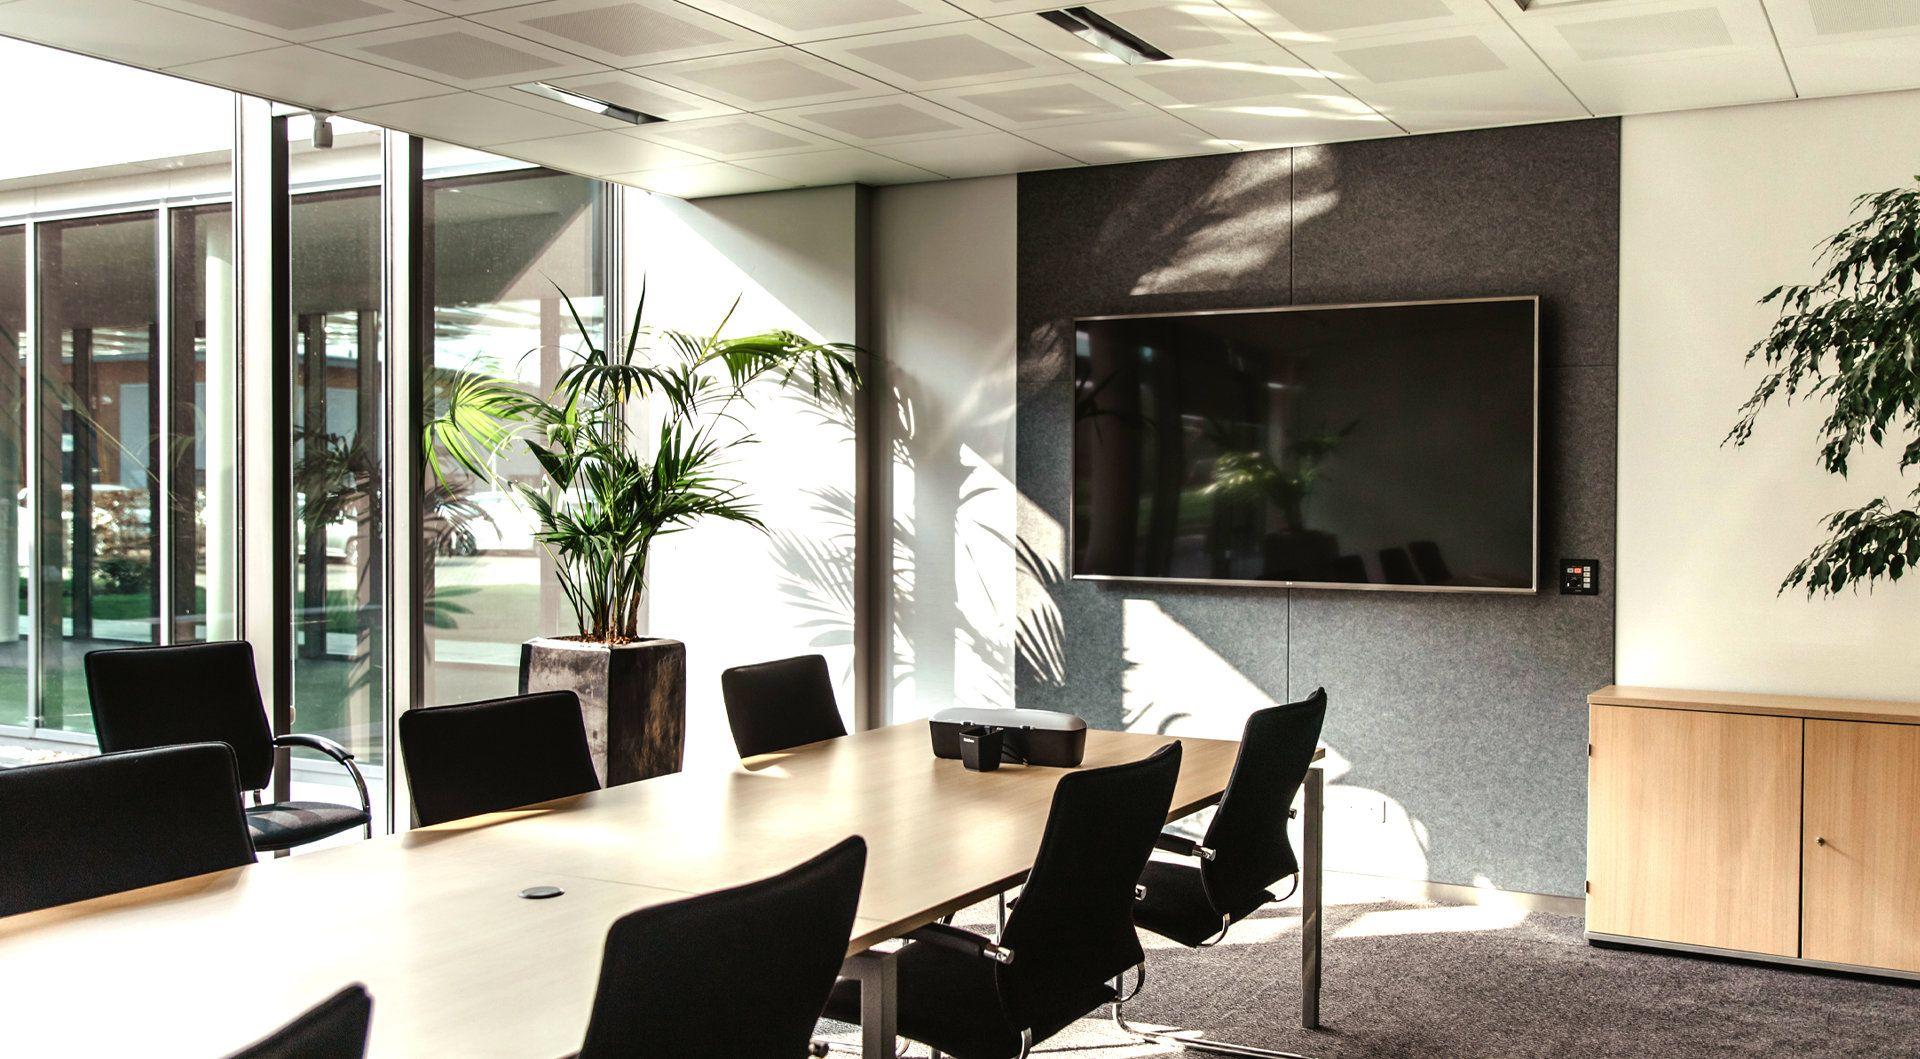 Epson EB-720 beamer/projector Plafondgemonteerde projector 3800 ANSI lumens 3LCD XGA (1024x768) Wit - Case studie de vries